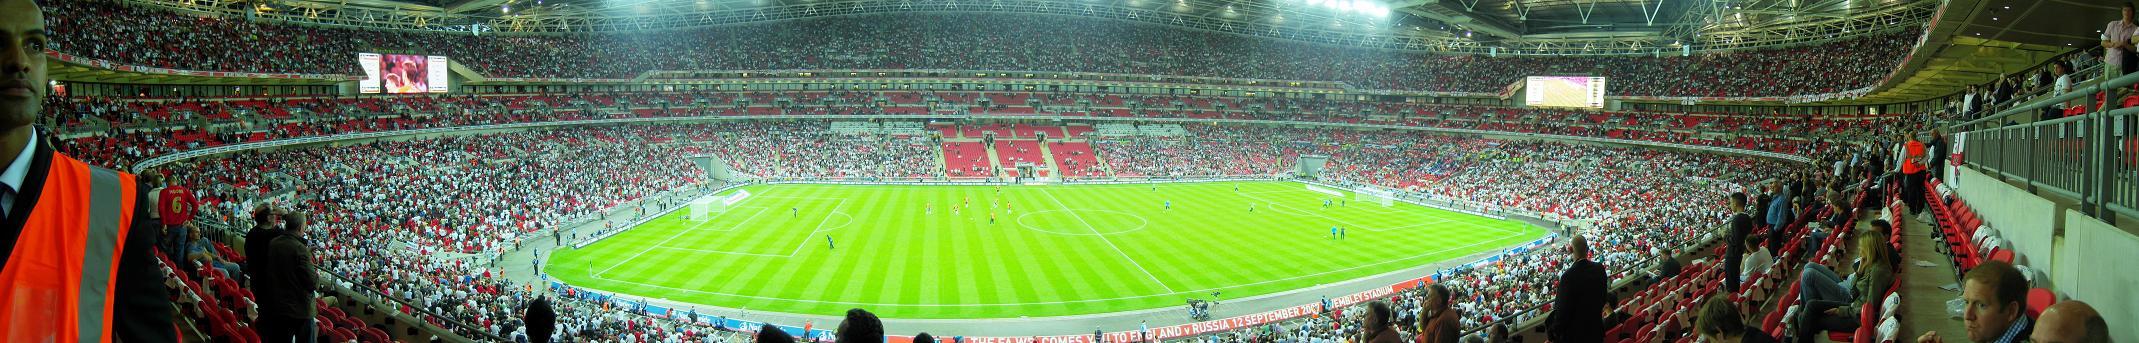 Панорама внутри стадиона «Уэмбли»